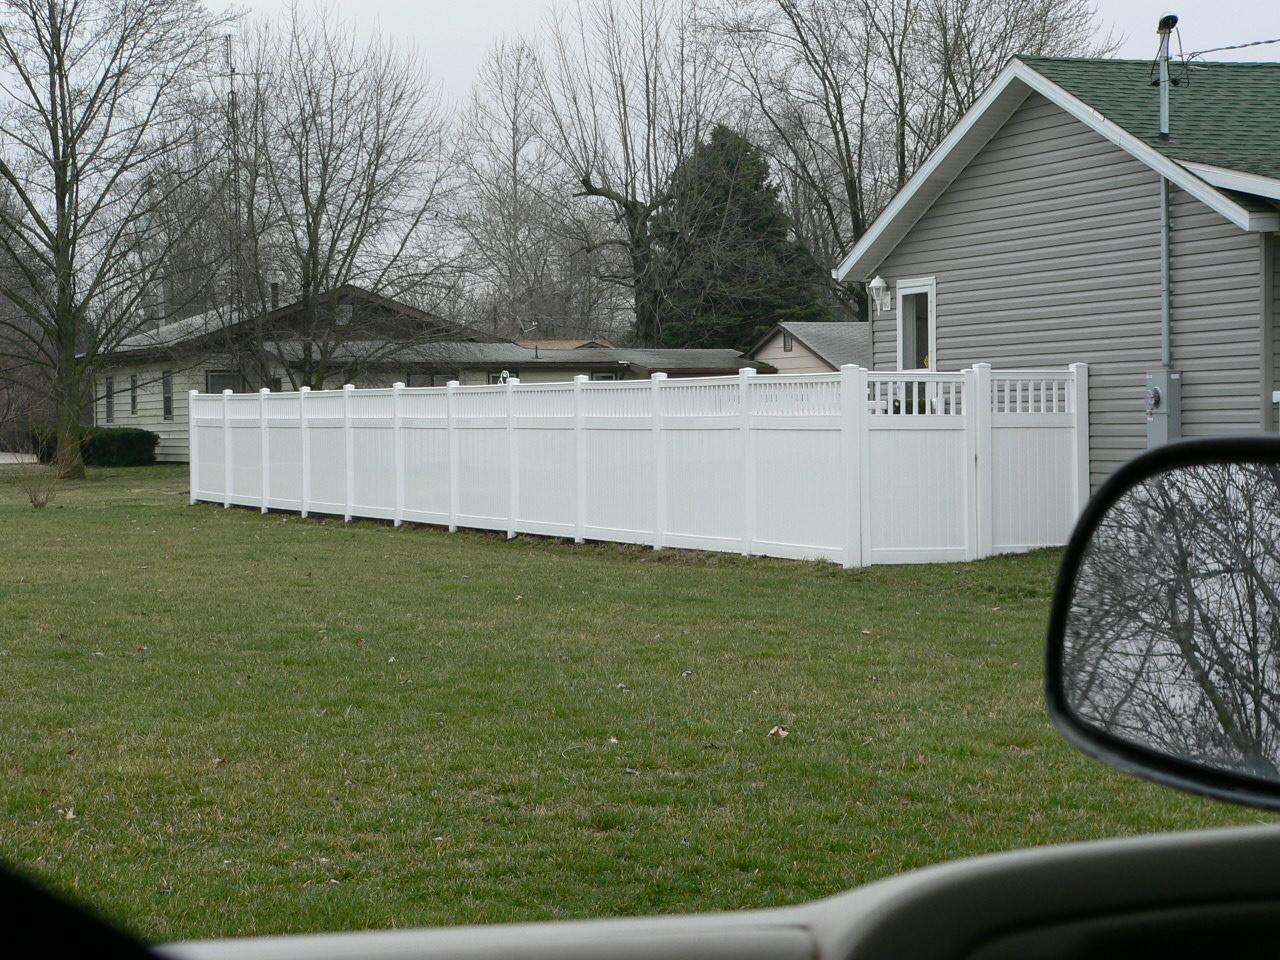 https://0201.nccdn.net/1_2/000/000/153/1c9/Fence-Master-074-1280x960.jpg